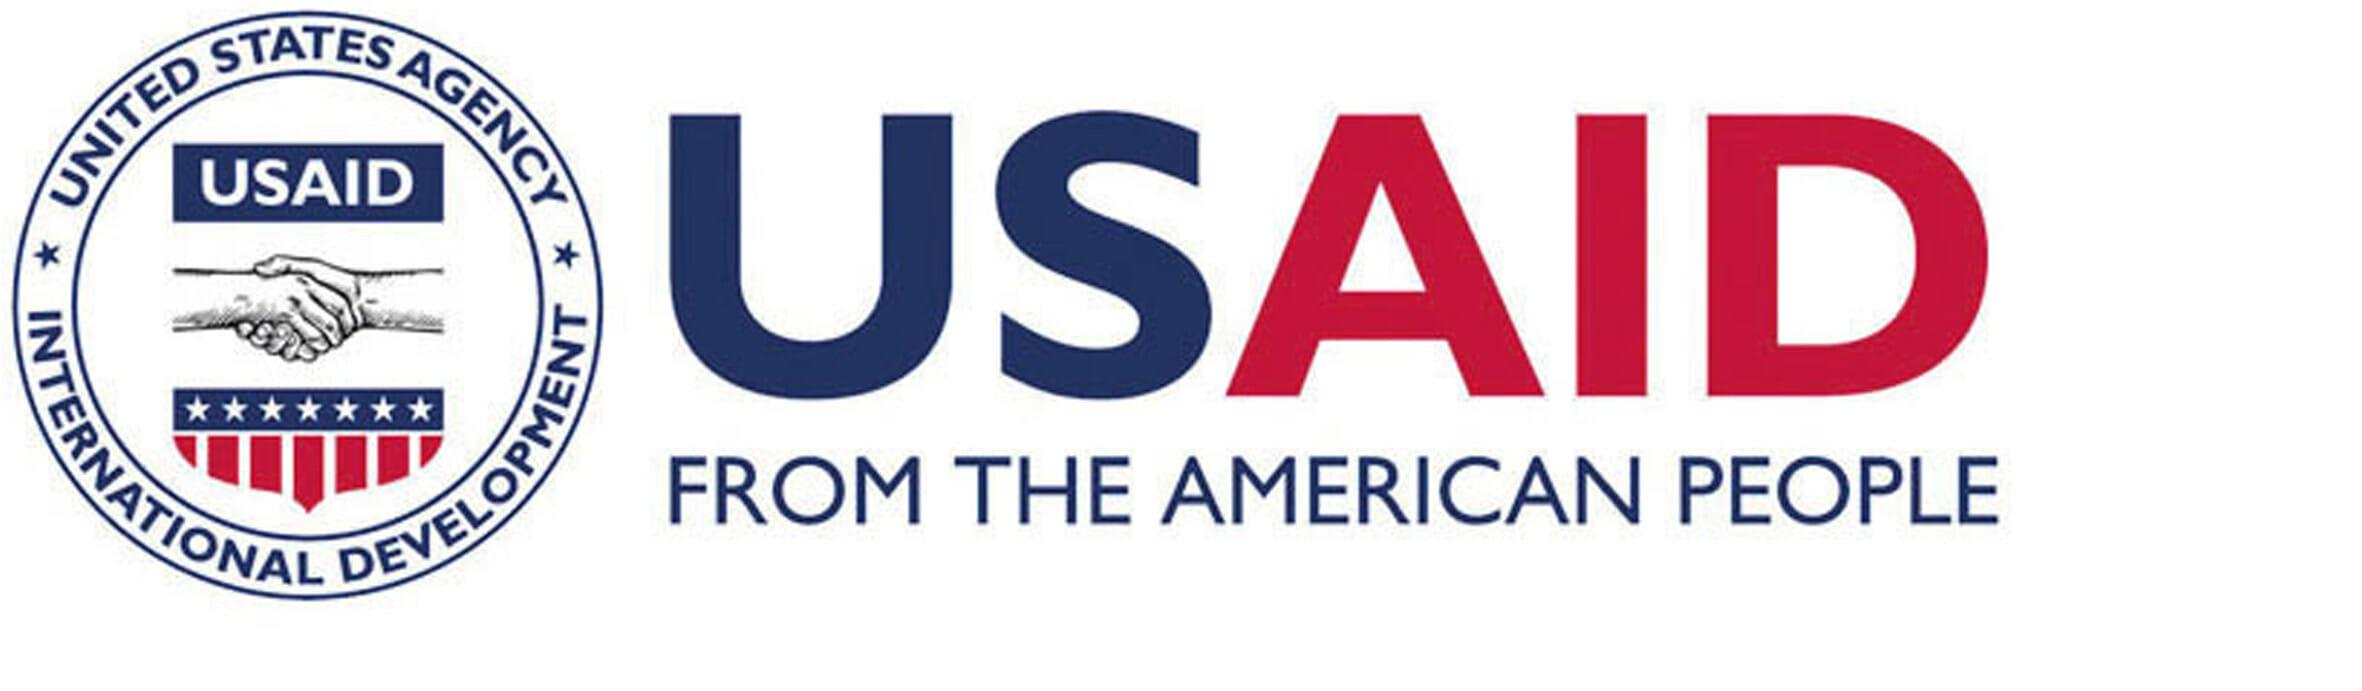 US-AID-logo-NEW